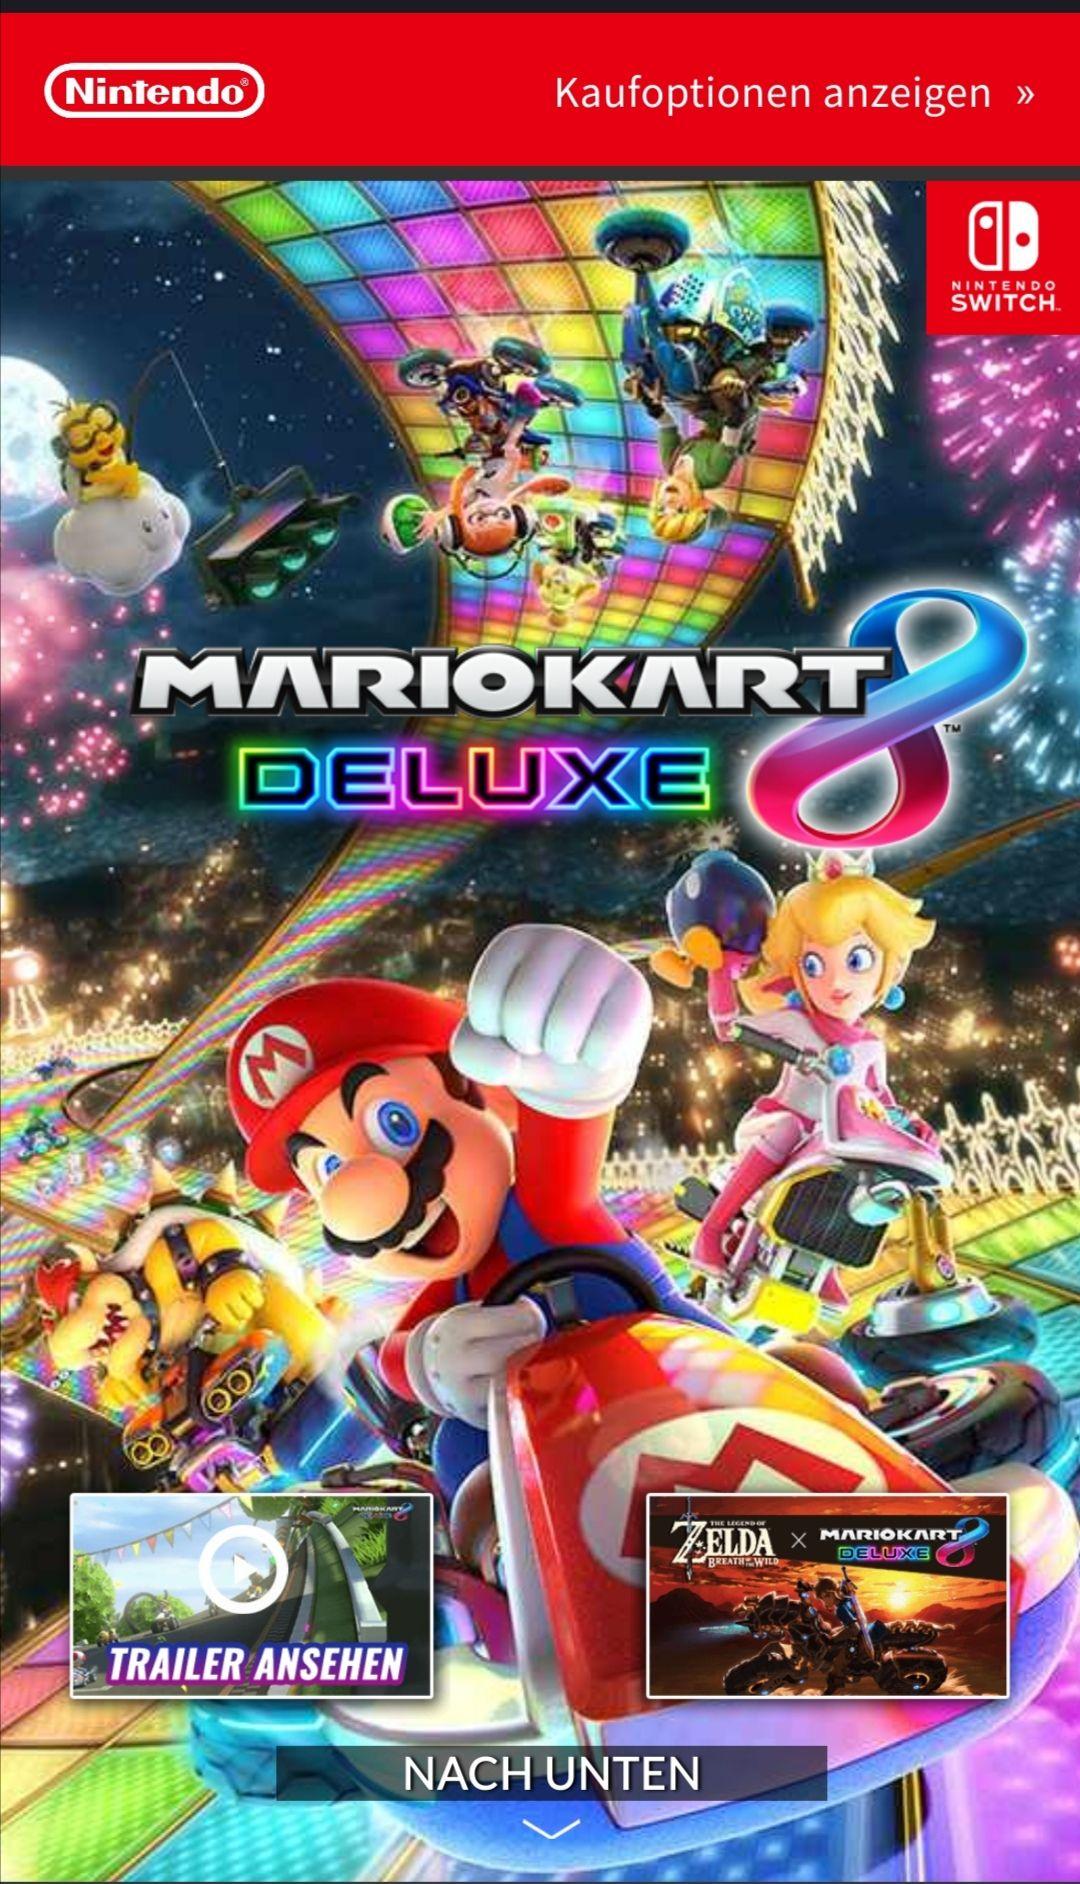 Mario Kart 8 Deluxe (Nintendo Eshop Download)